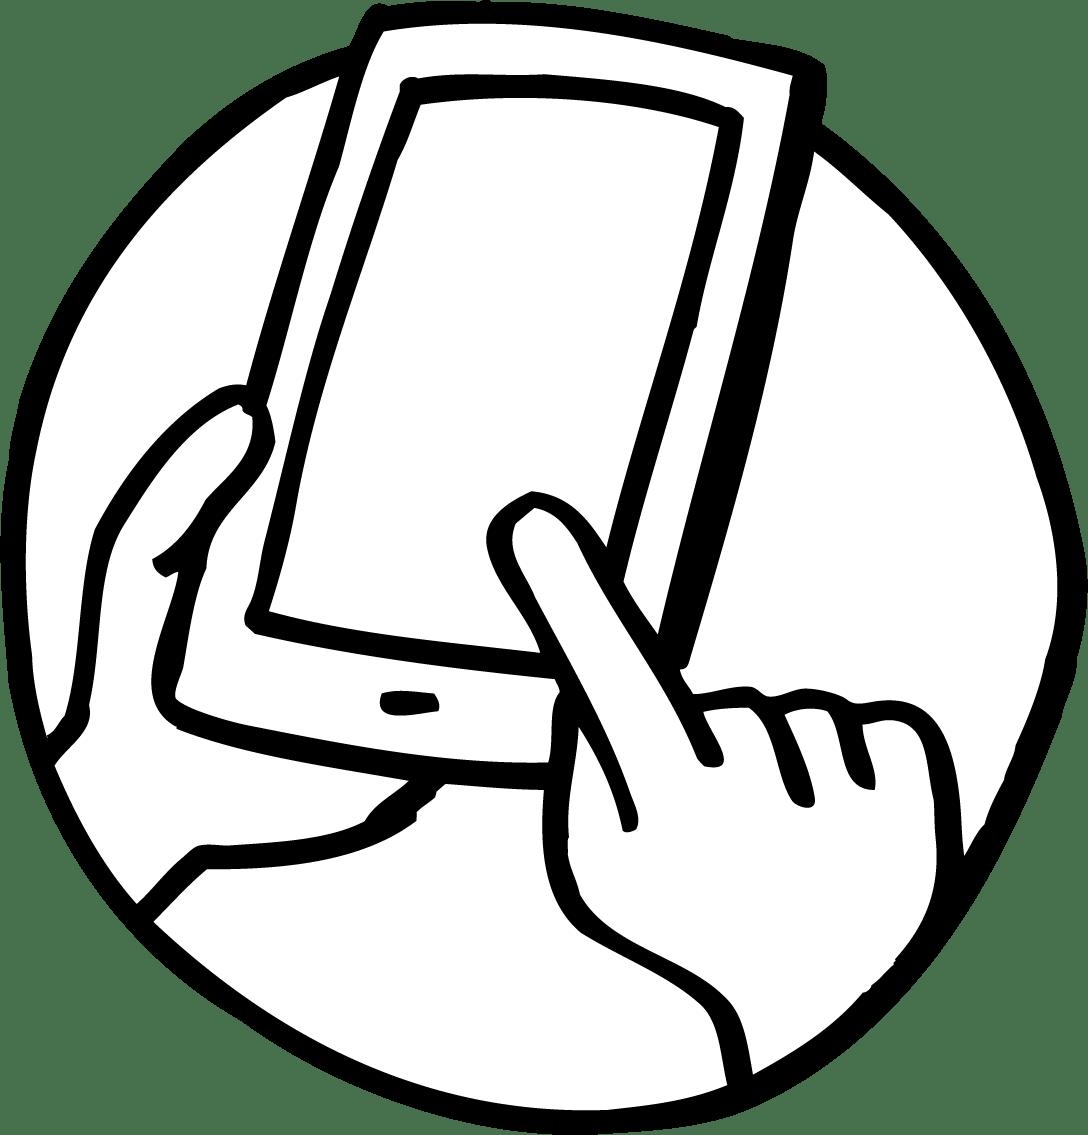 Icarol Assists Kids Help Phone